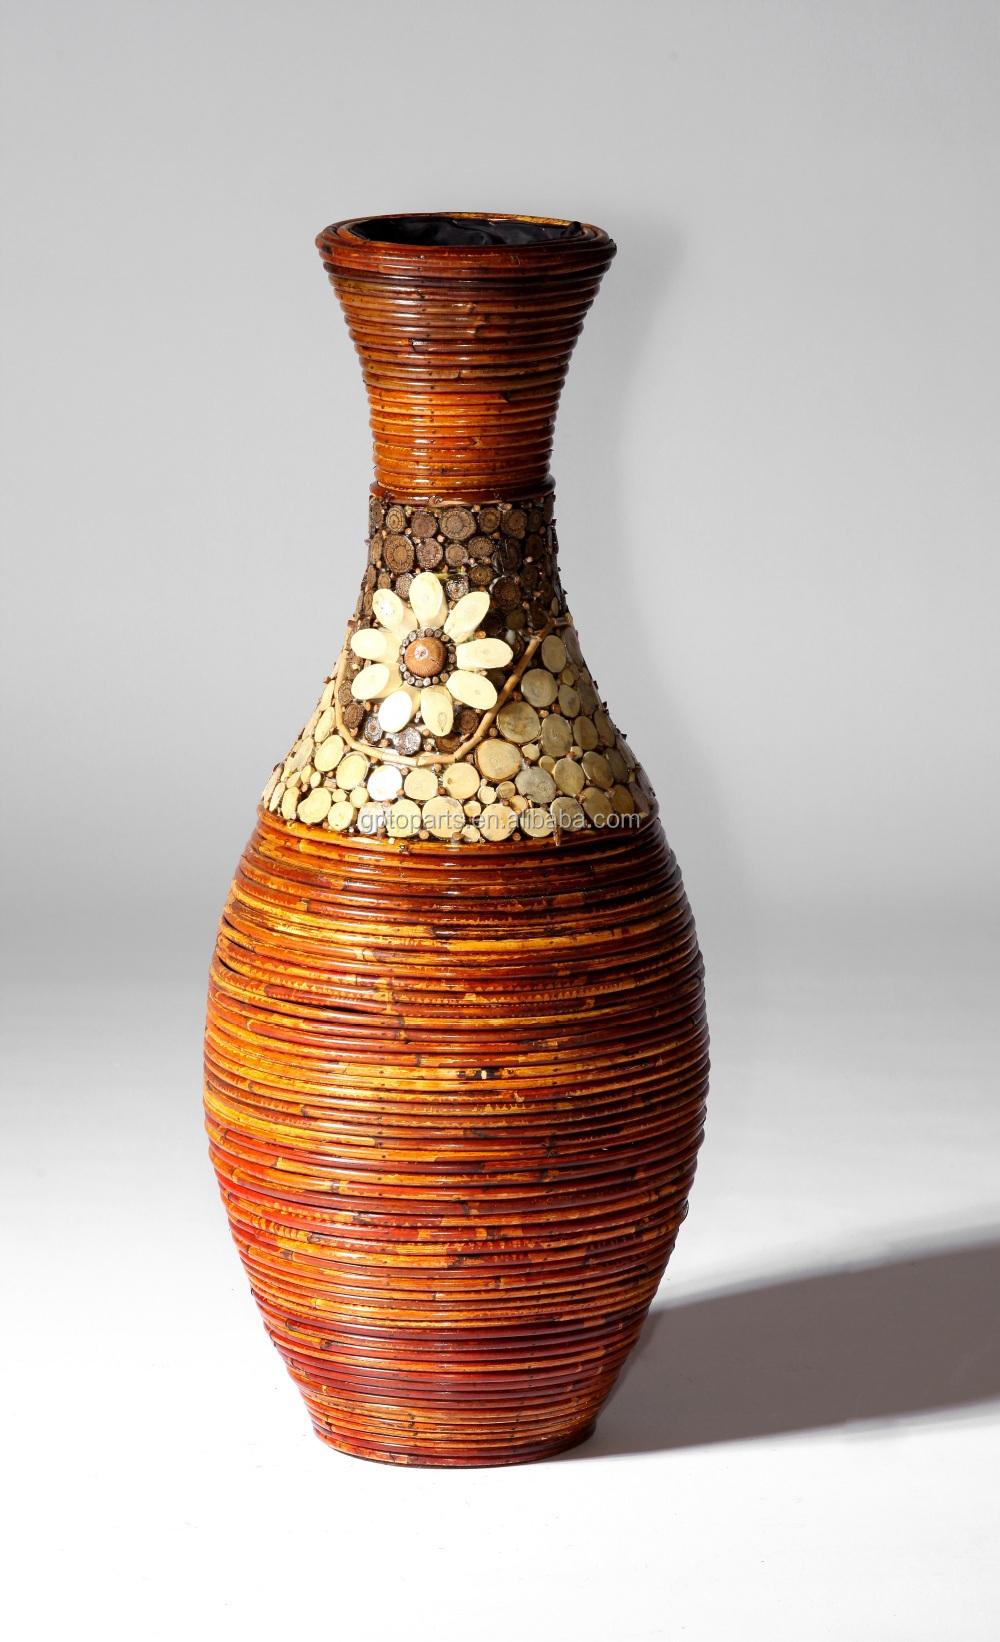 Large Round Willow Wicker Corner Vases Baskets Wicker Home Decor